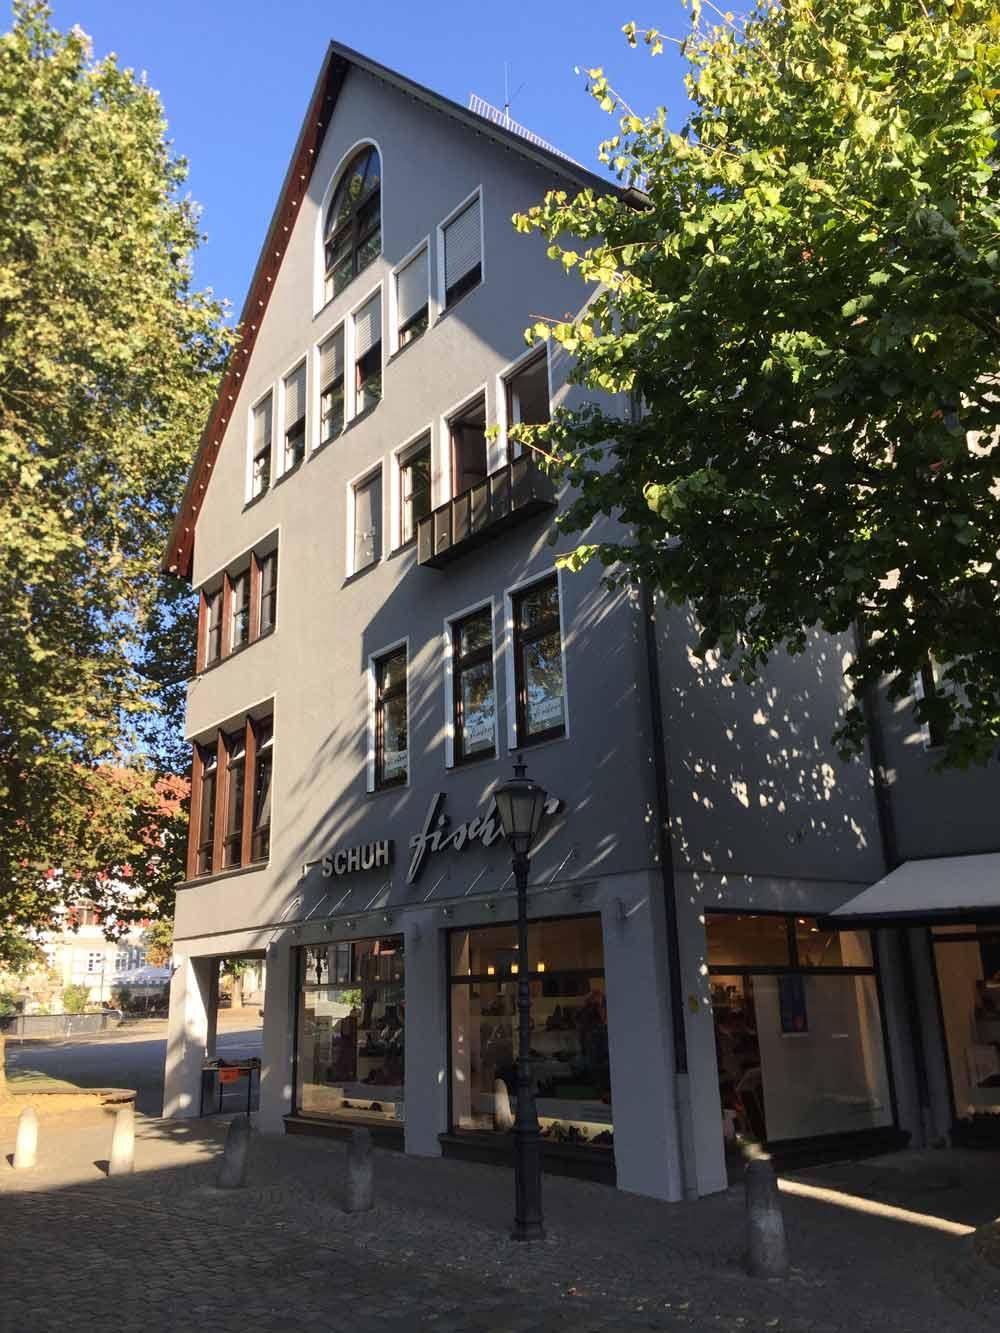 Altbausanierung & Denkmalschutz in Esslingen & Umgebung | Hübsch:Vogt